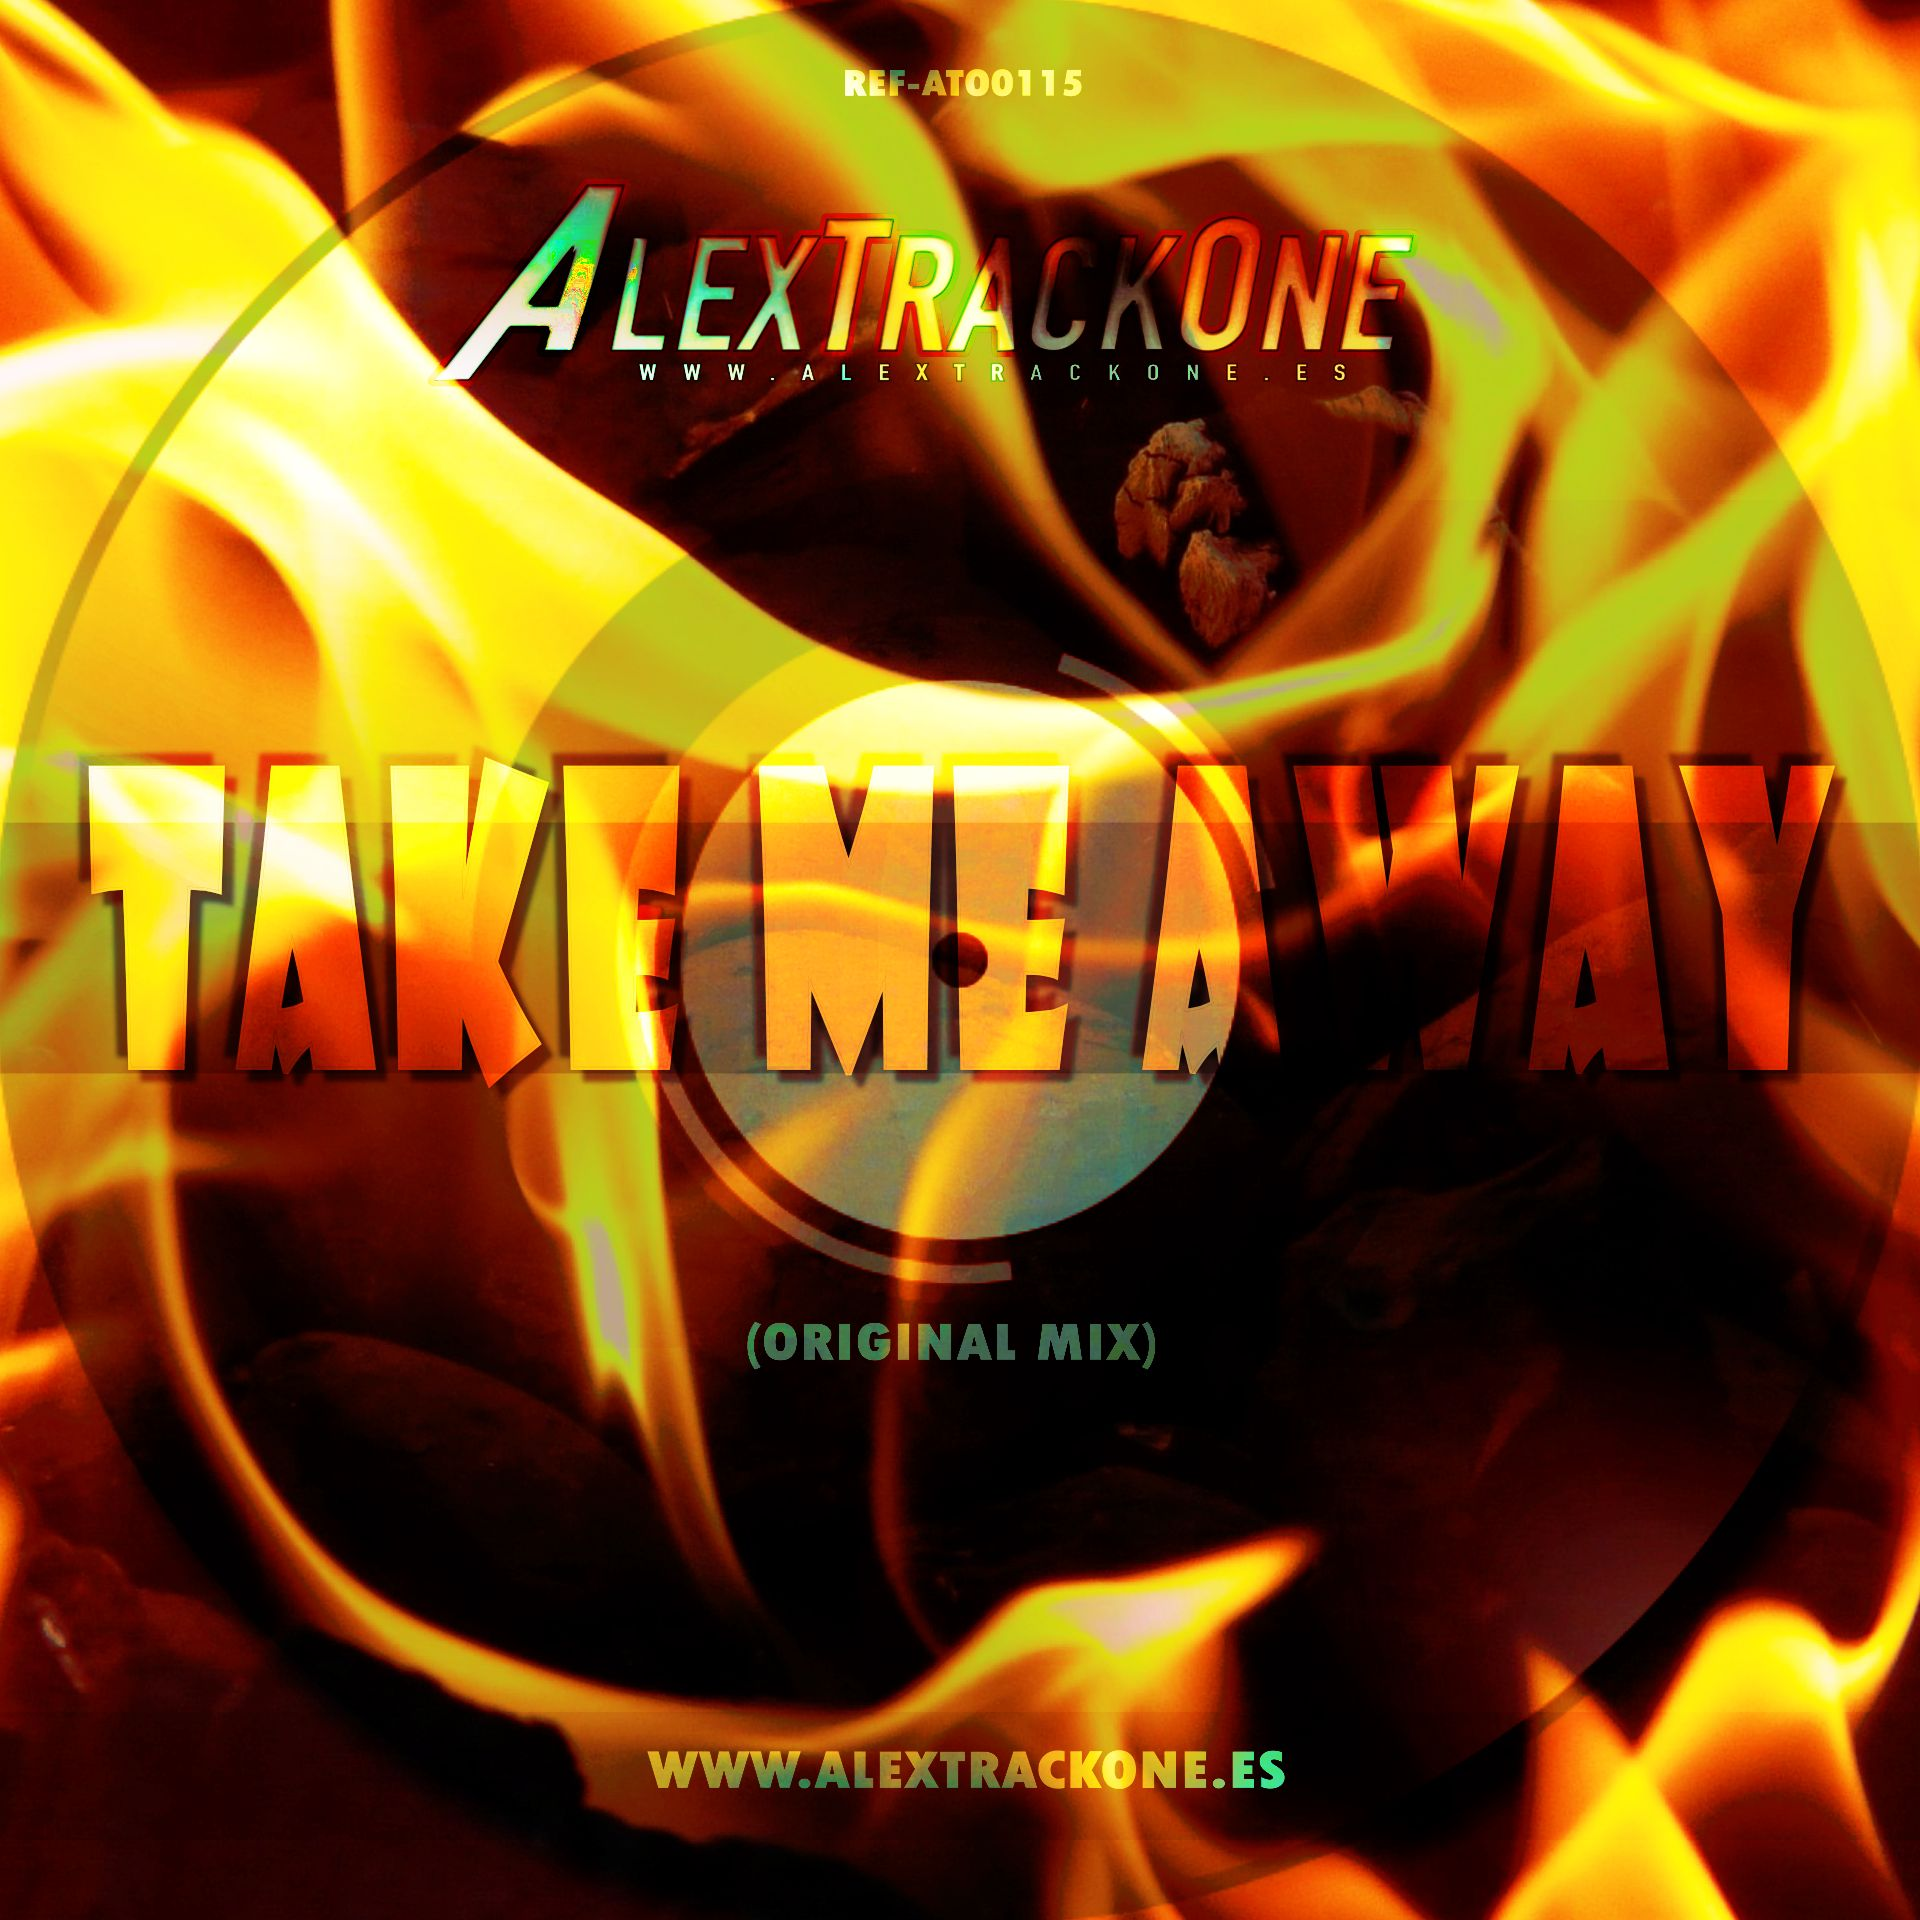 REF-ATO0115 TAKE ME AWAY (ORIGINAL MIX) (MP3 & WAV & FLAC)